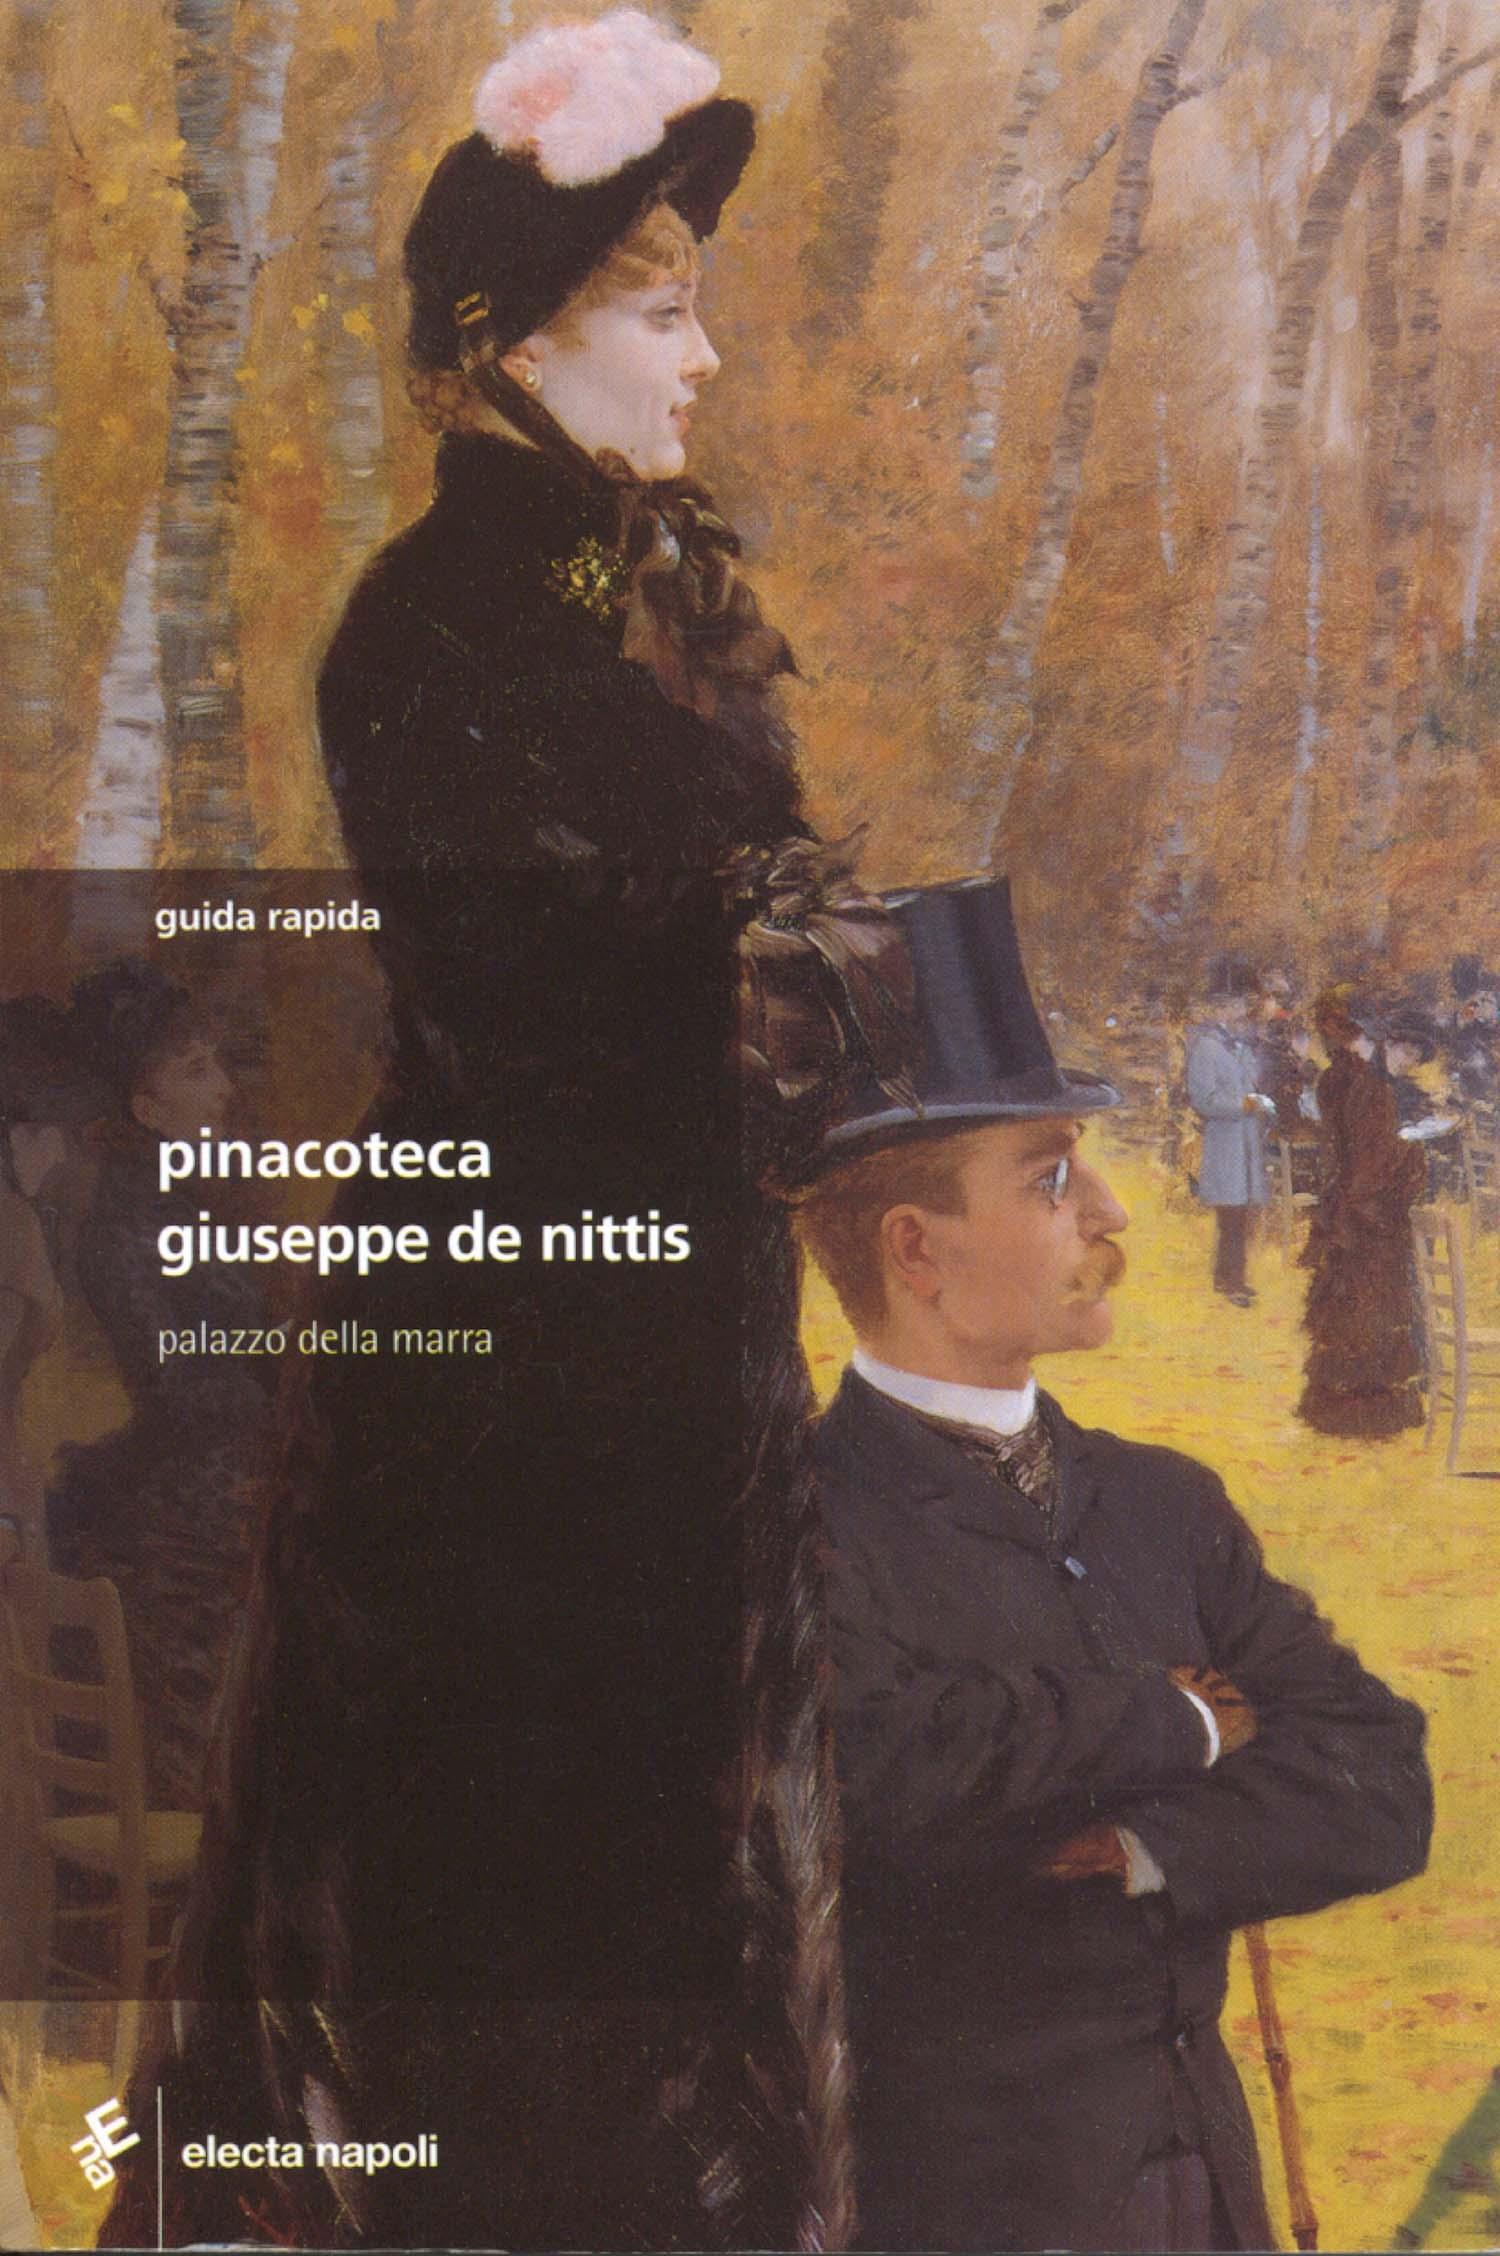 PINACOTECA-GIUSEPPE-DE-NITTIS-1.jpg